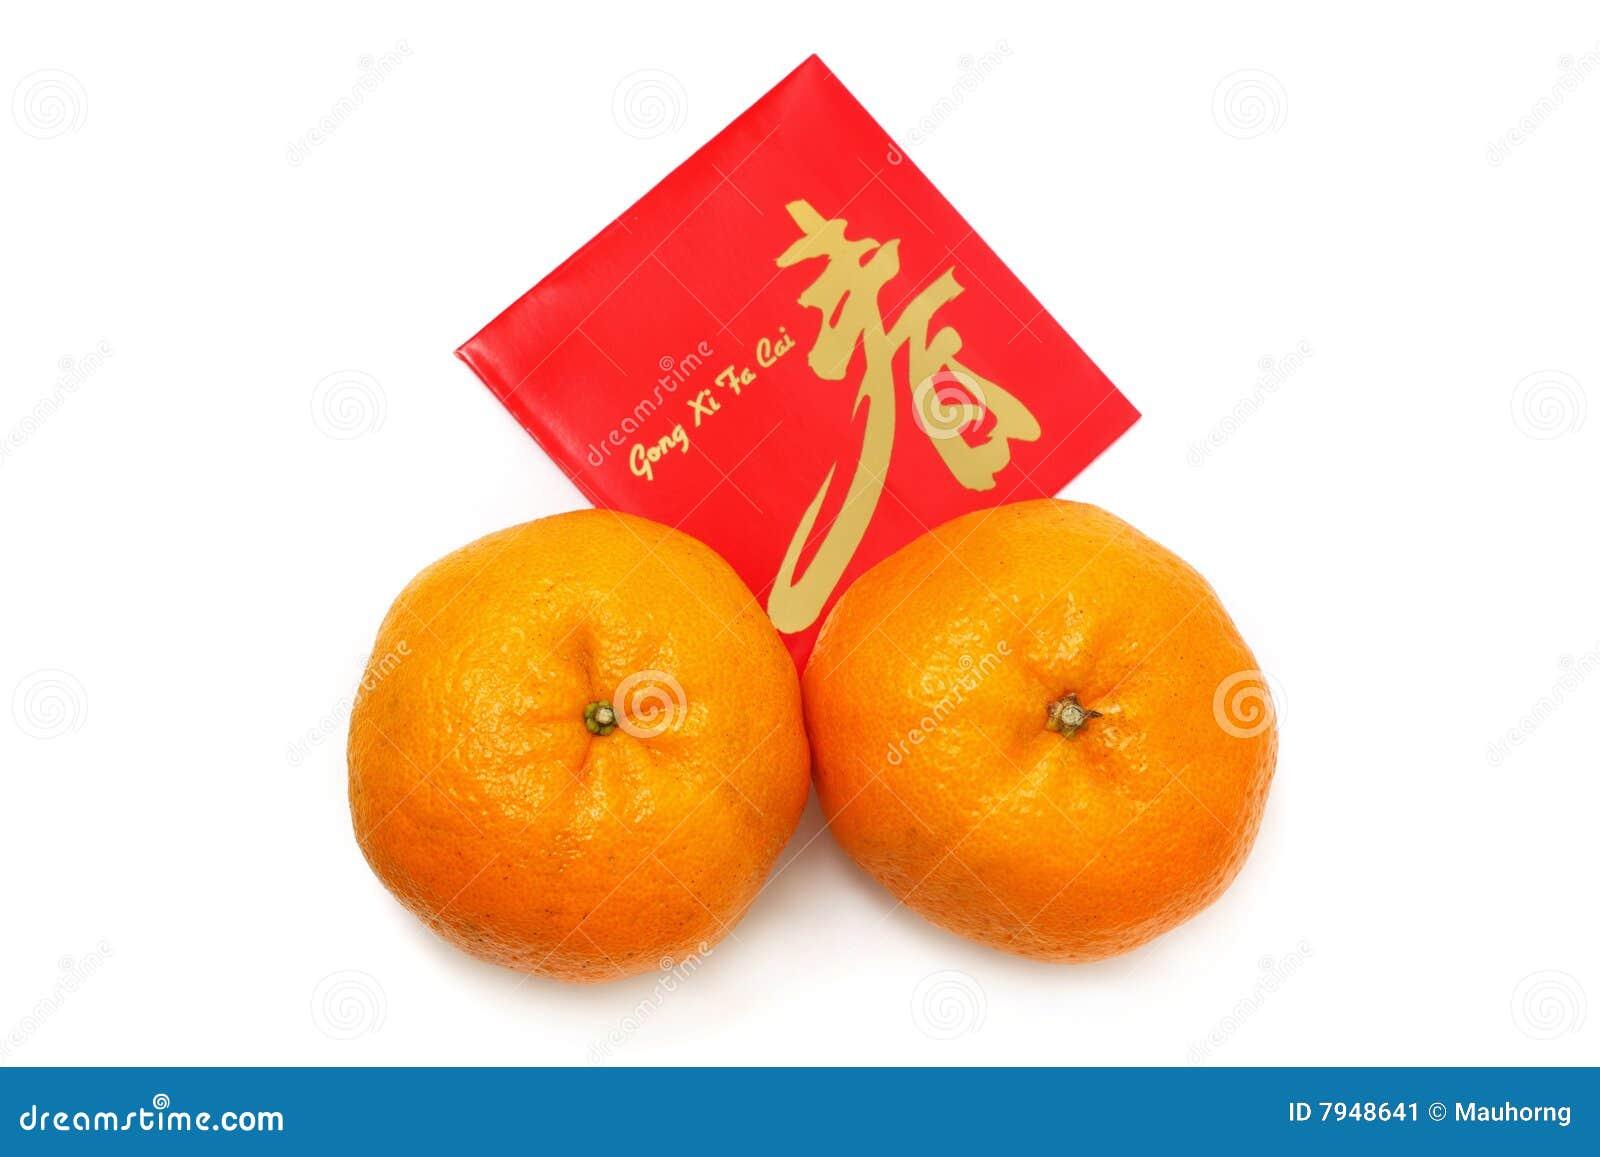 Mandarin Orange And Red Packet Stock Image - Image: 7948641